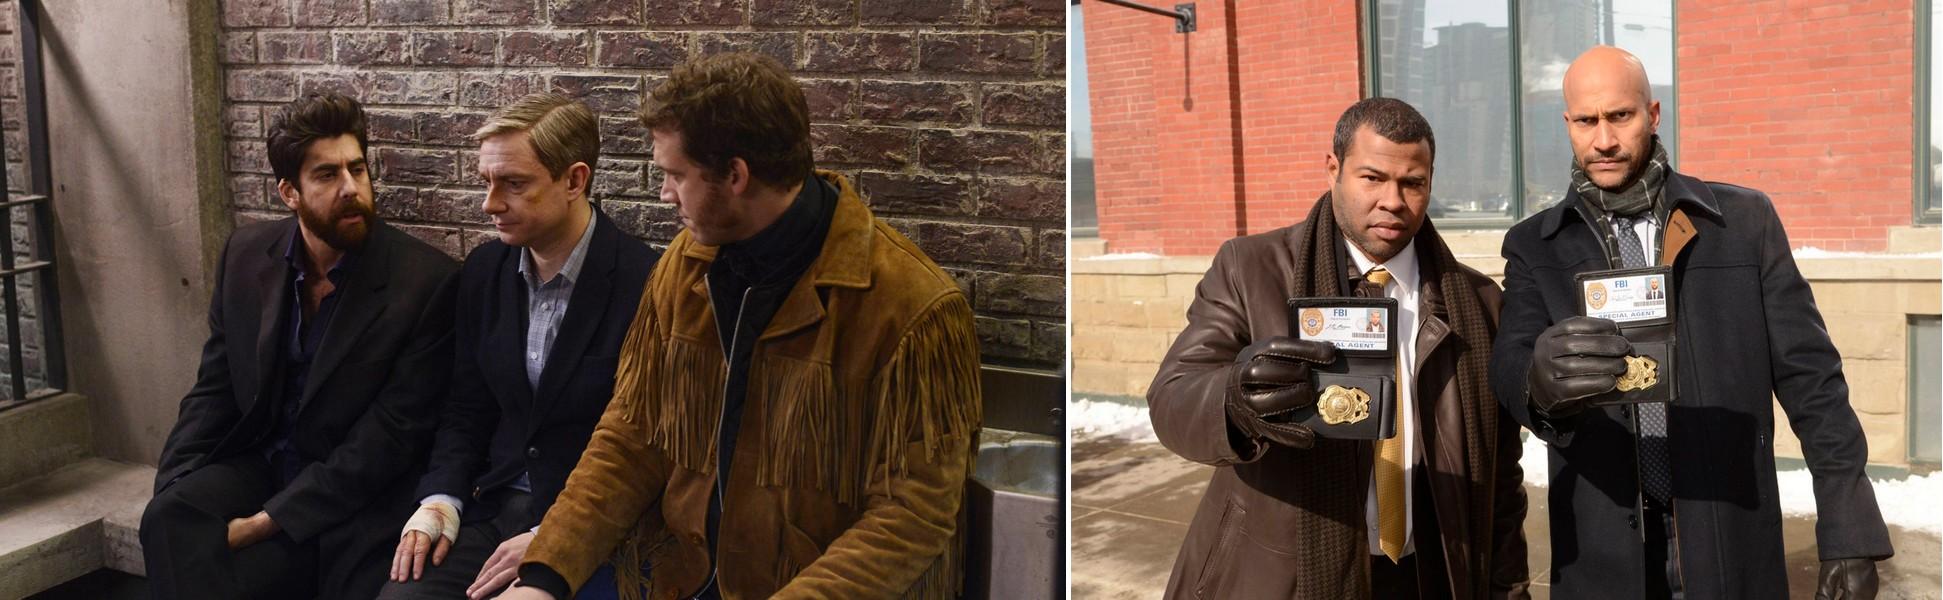 Fargo-dvojice